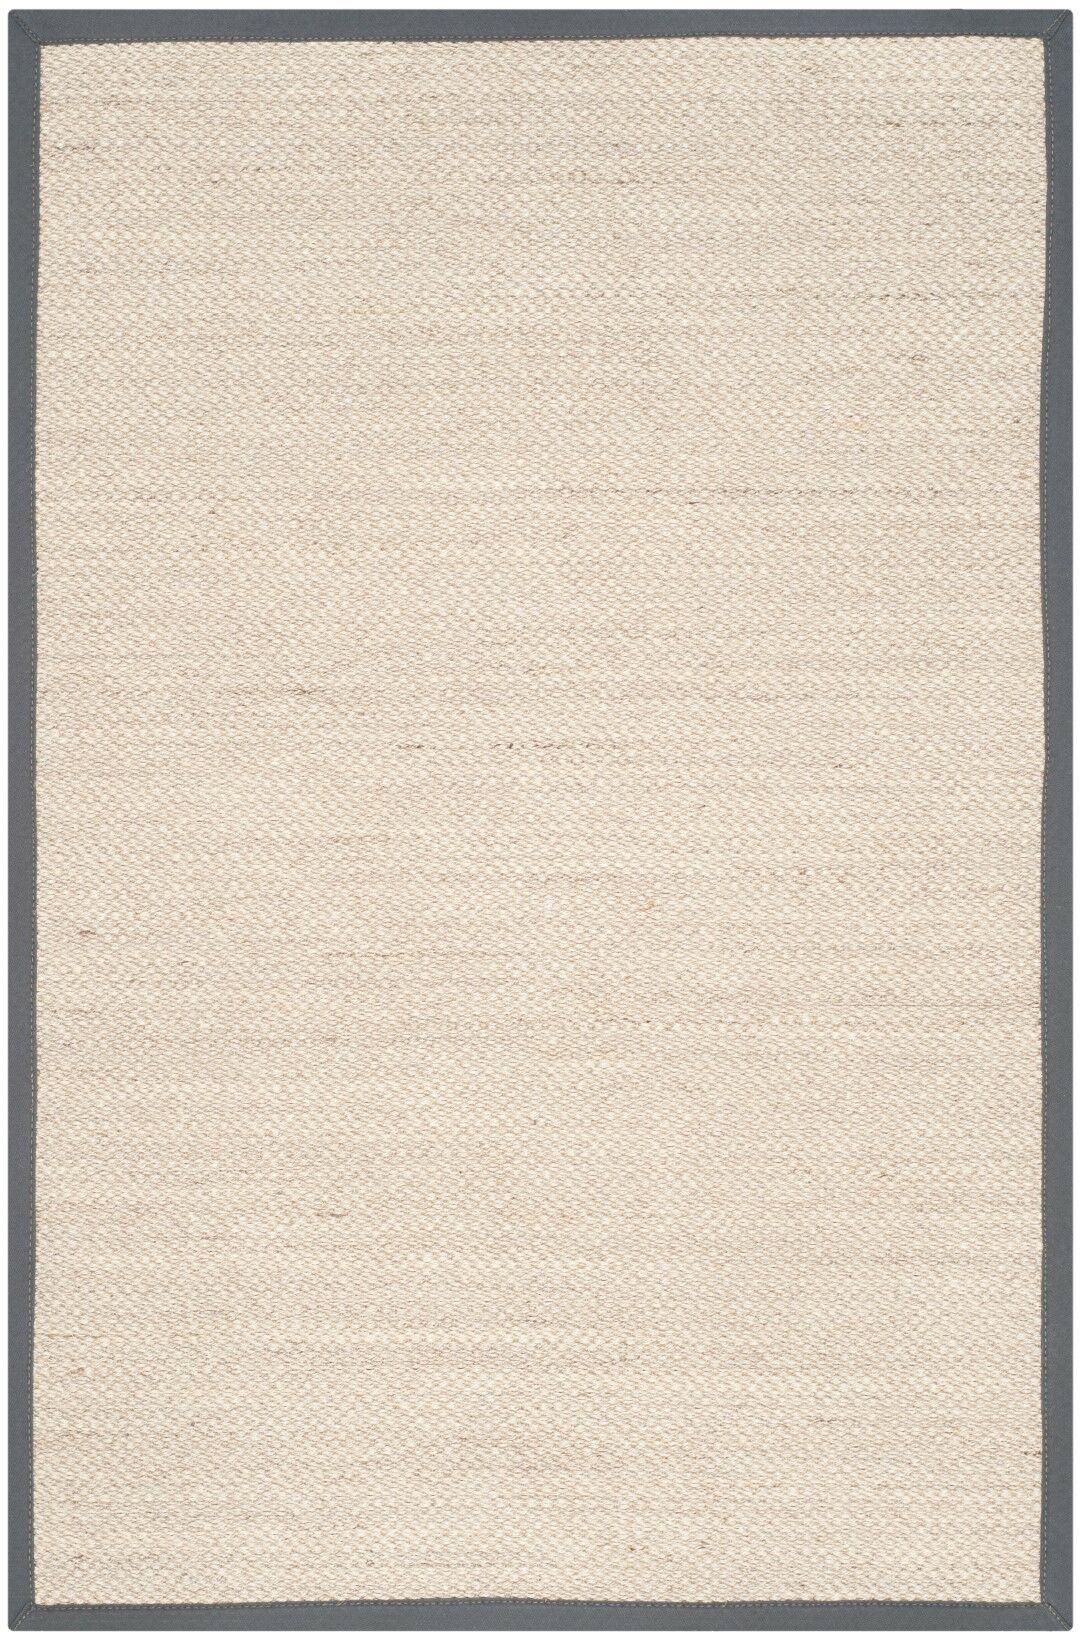 MonadnockBeige/Gray Area Rug Rug Size: Rectangle 4' x 6'